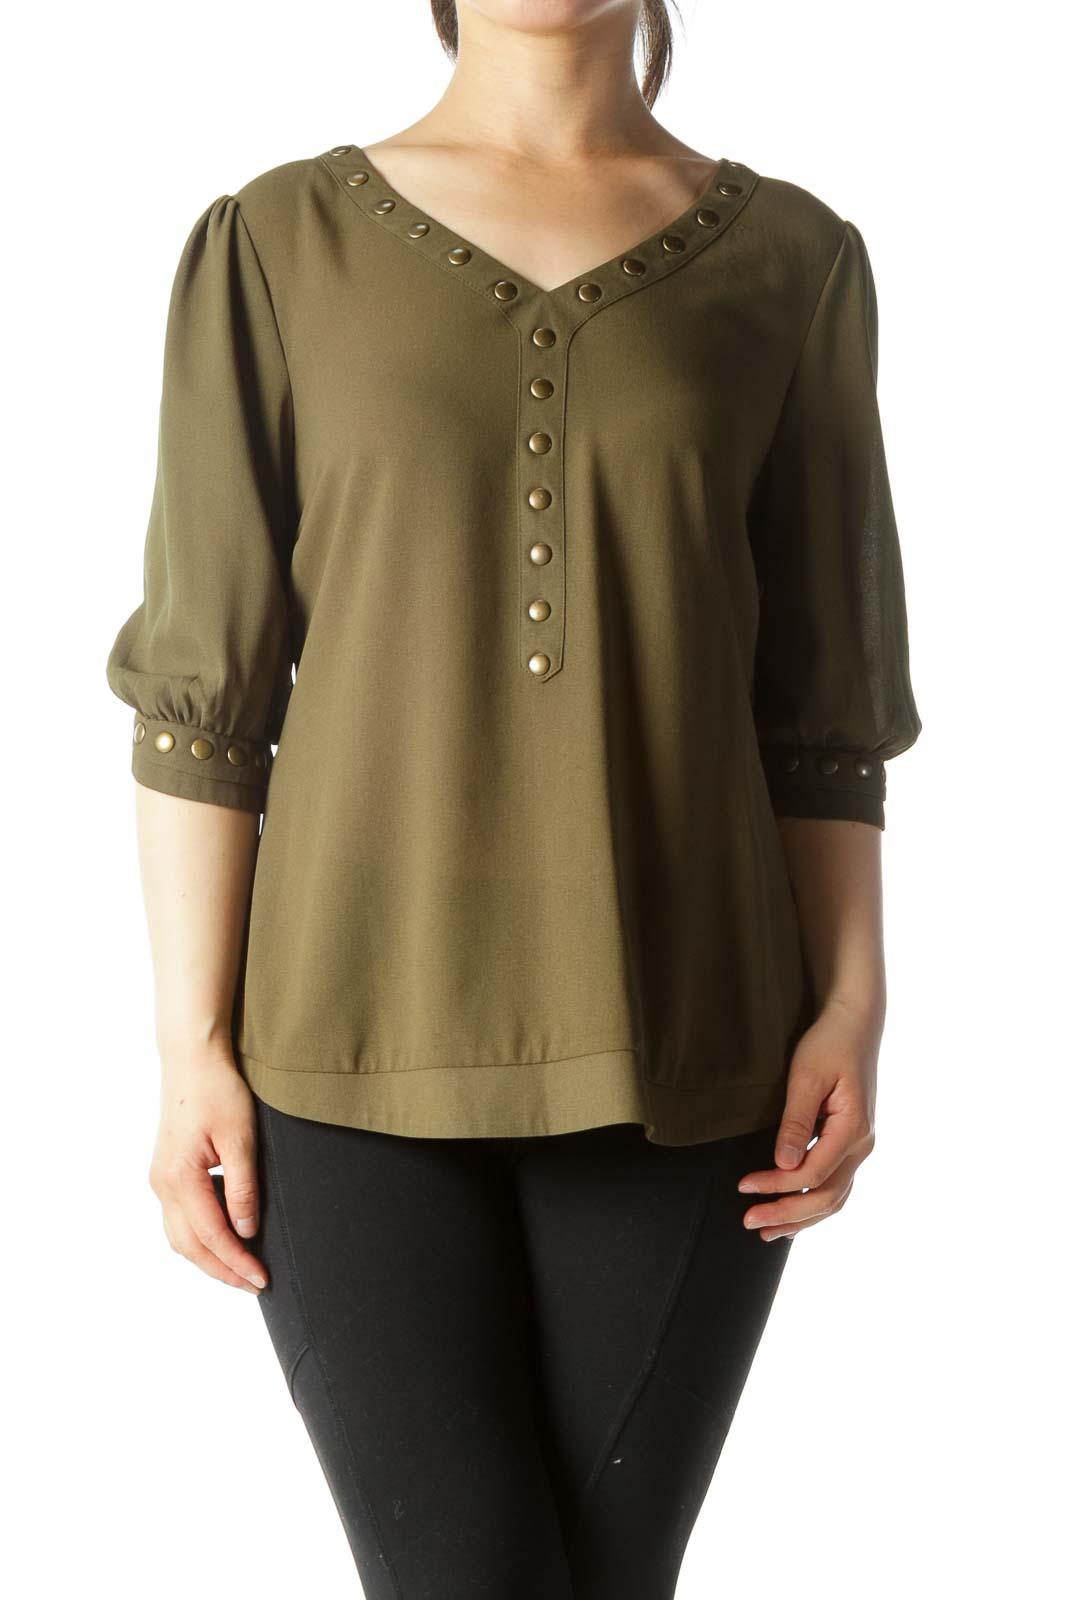 Olive Green V-Neck Studded 3/4-Sleeve Stretch Blouse Front